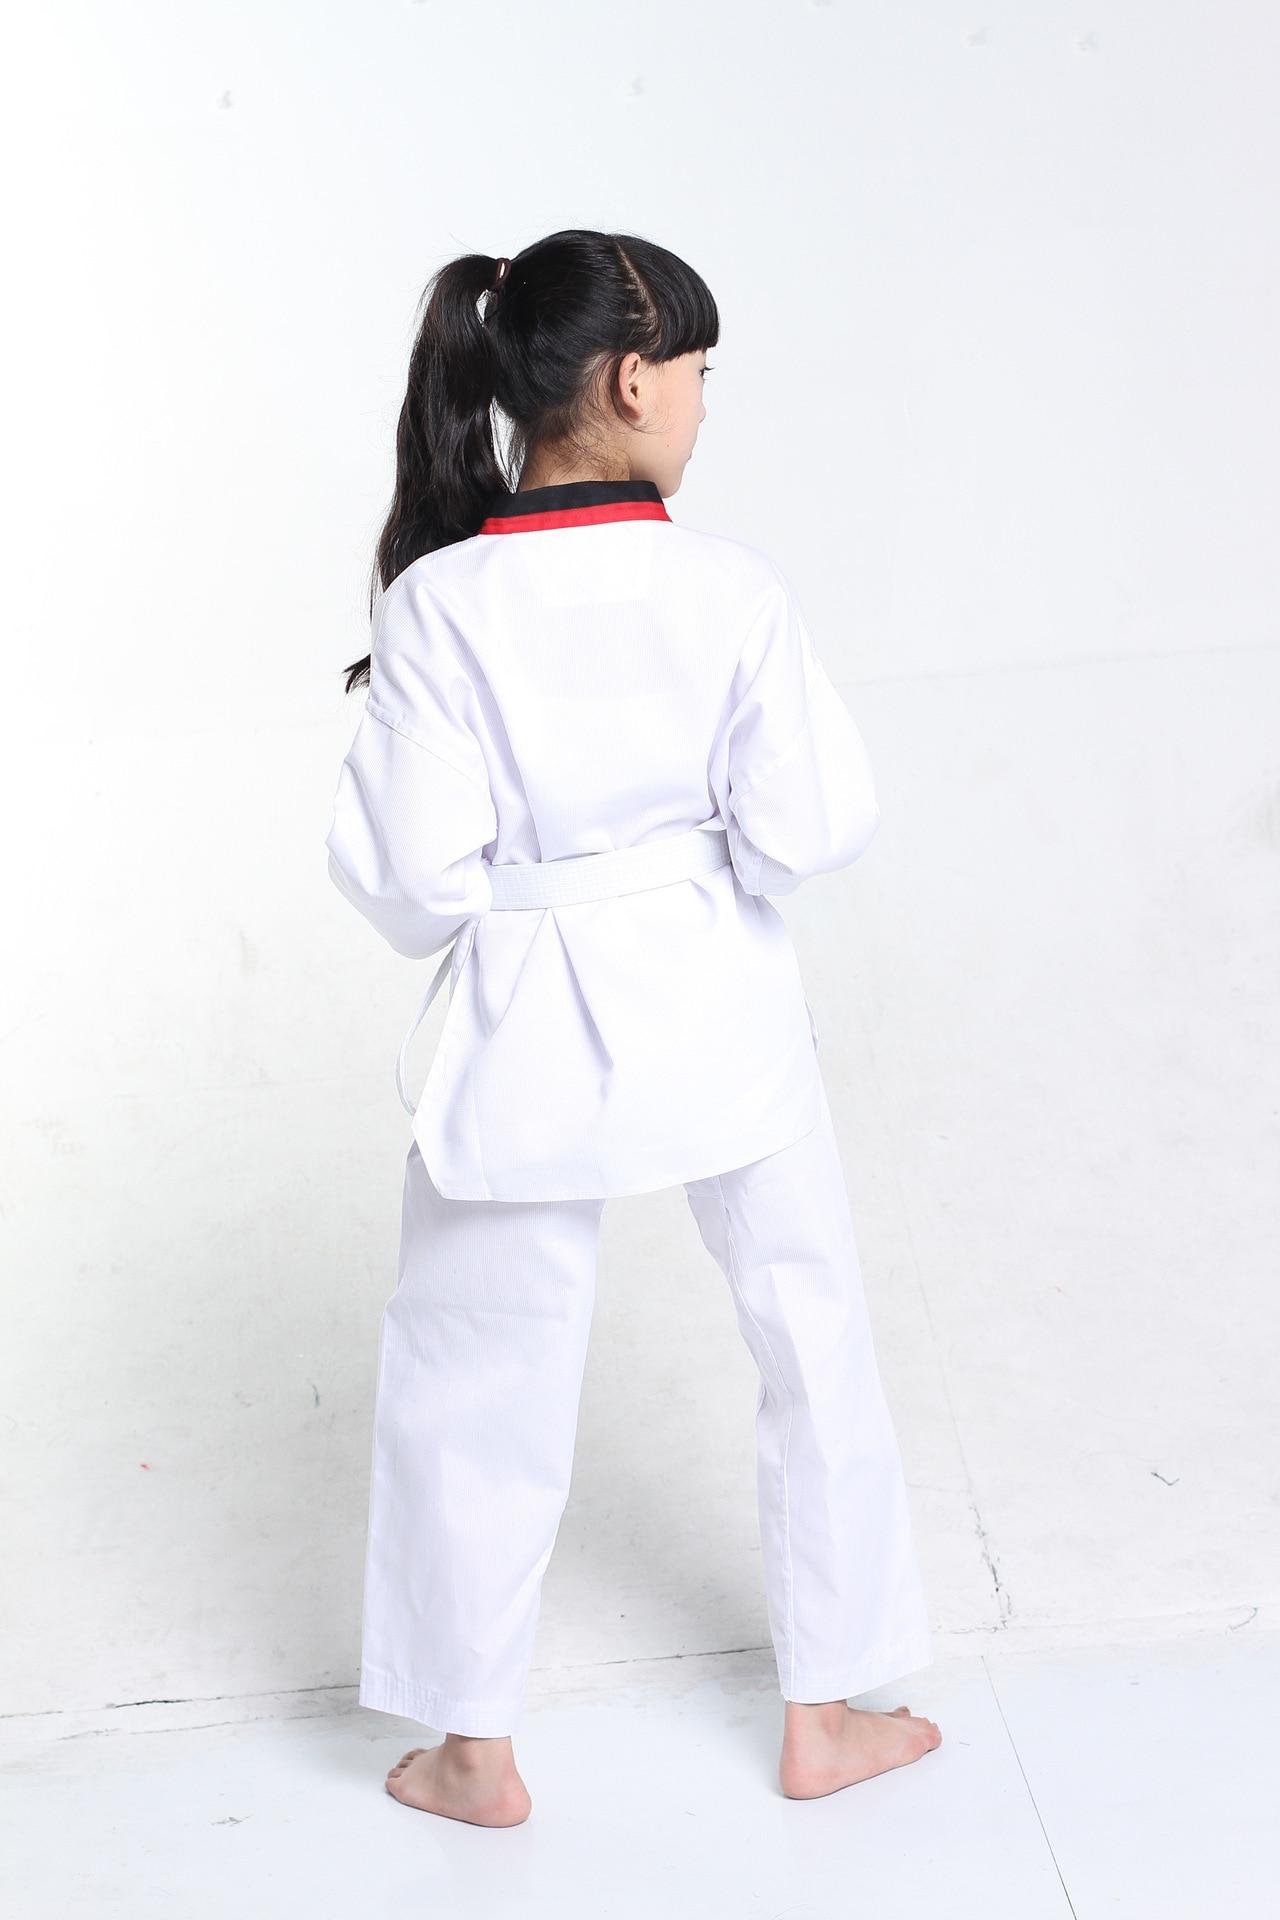 Children Kimono Judo Kickboxing Practice Costume White Kids Boys Girls Taekwondo Suit Karate Tae Kwon Do Clothes F106 5